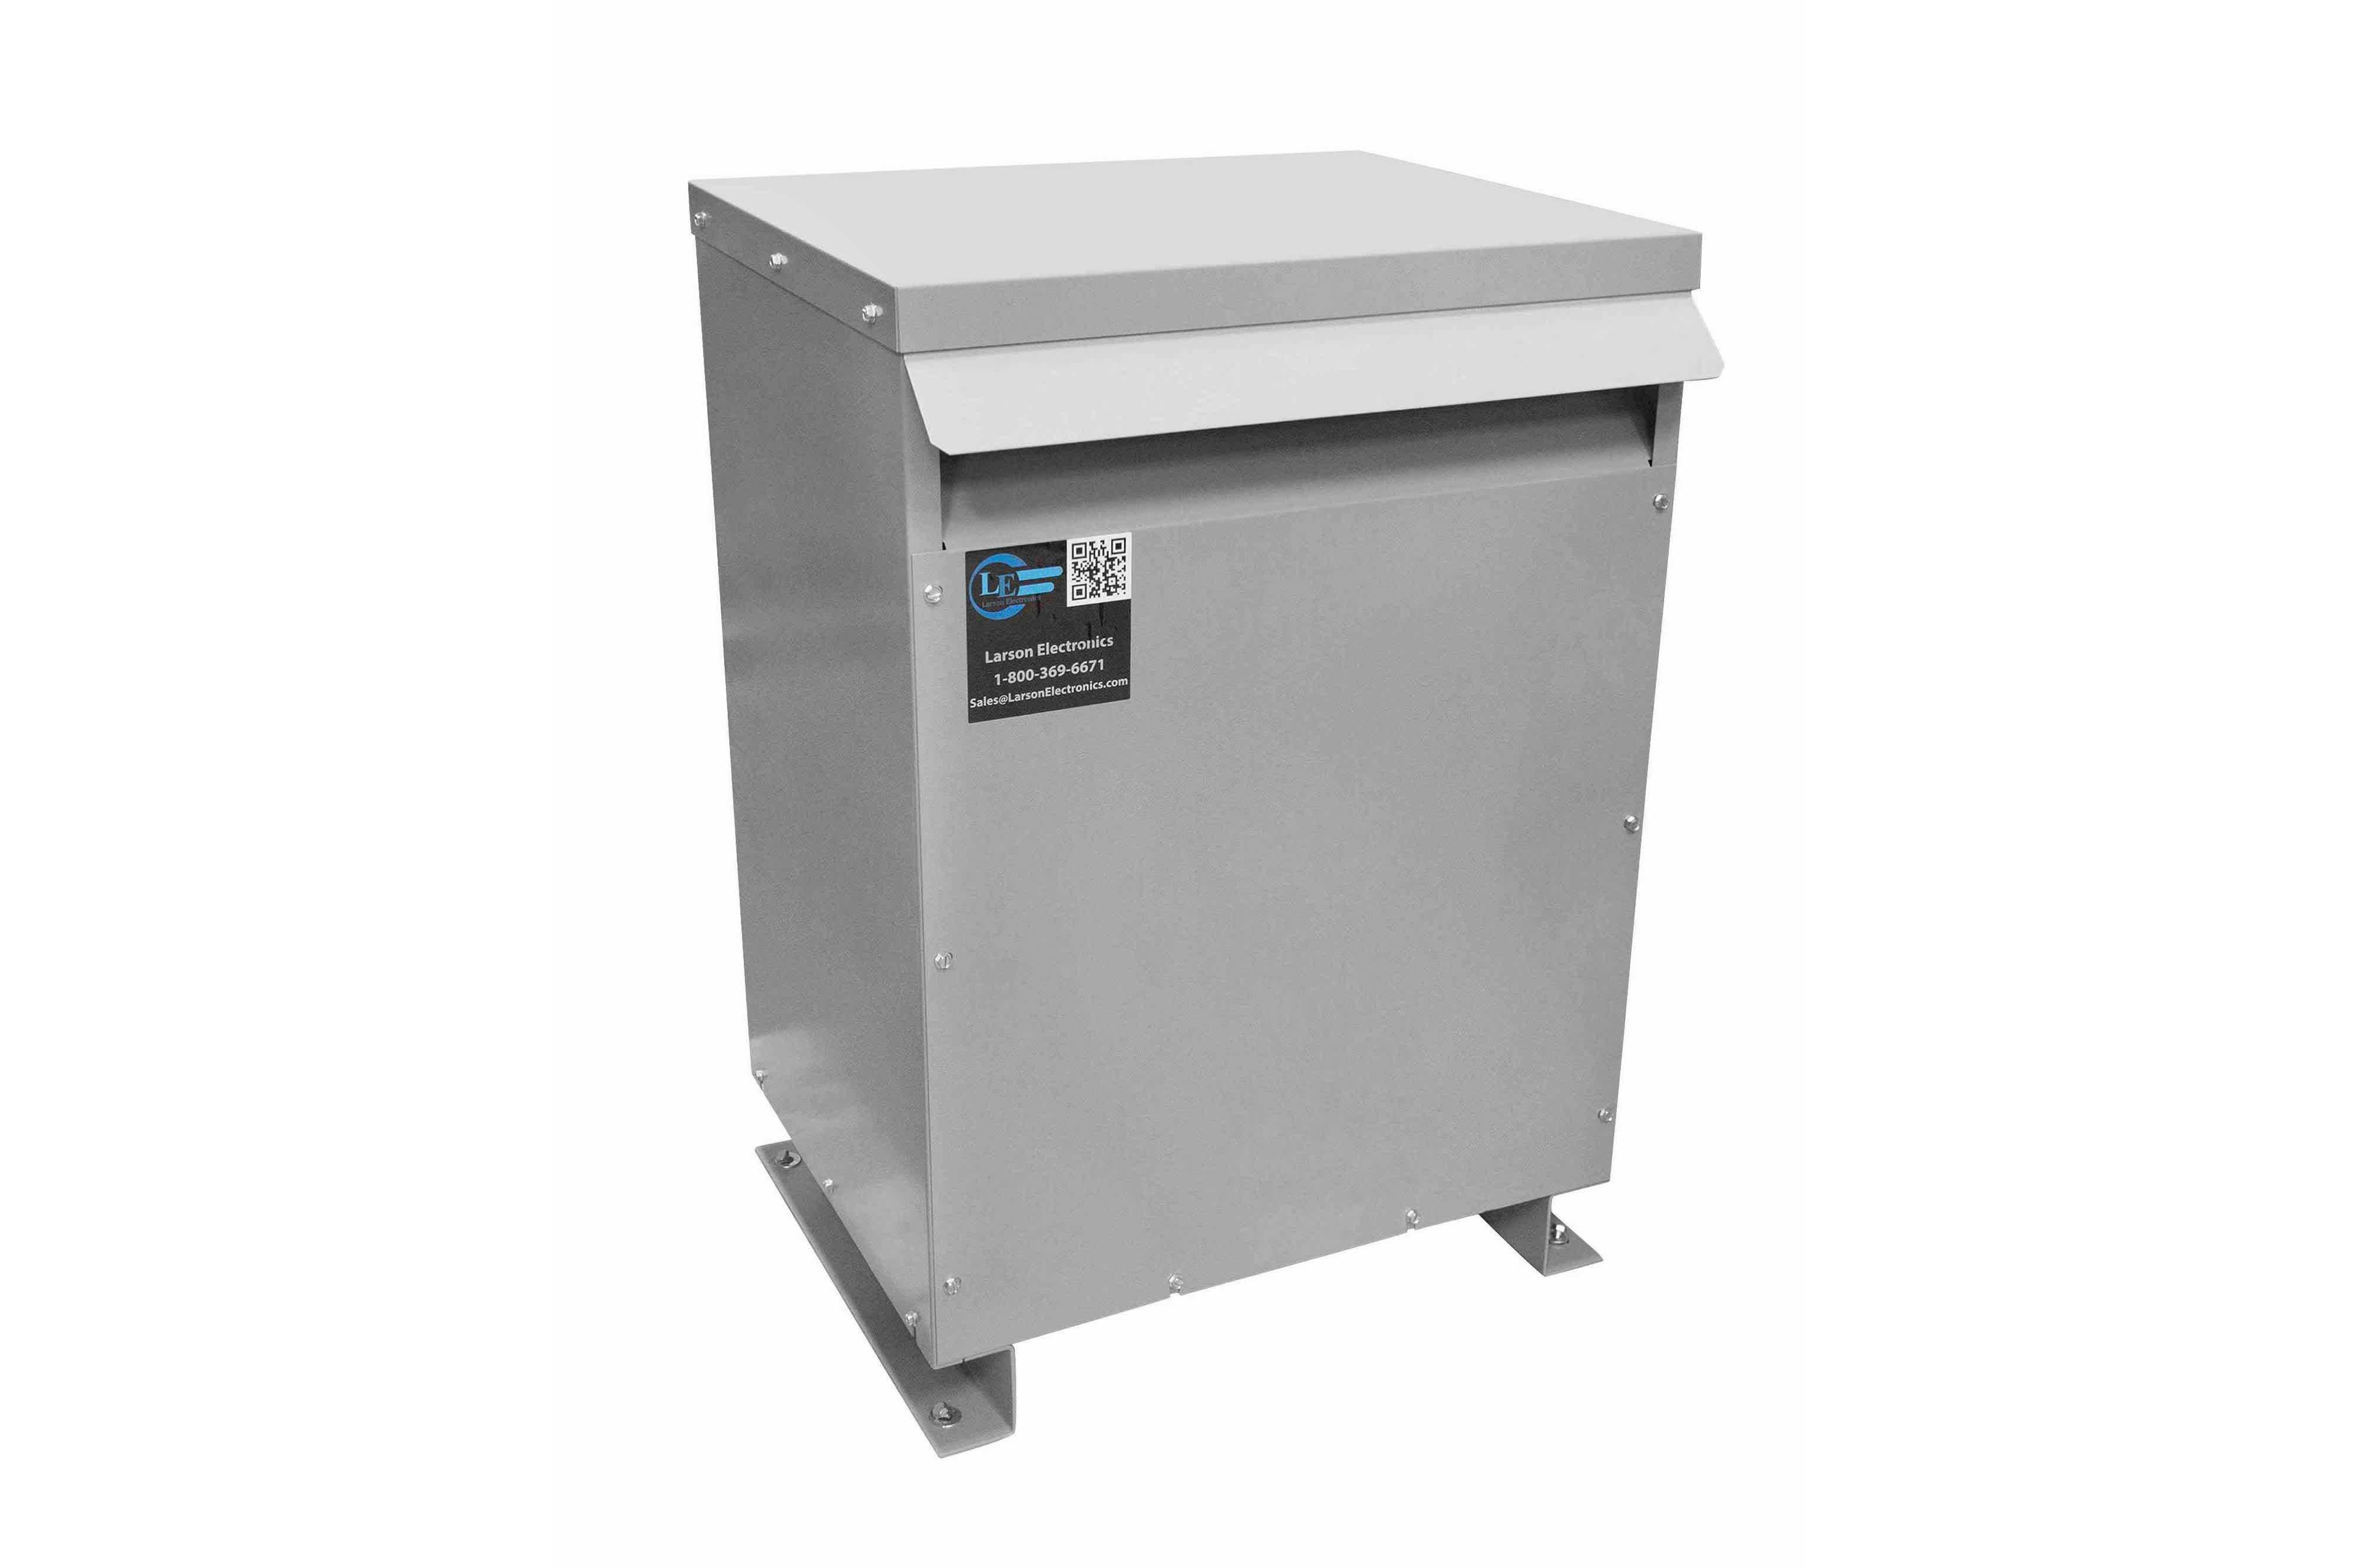 36 kVA 3PH DOE Transformer, 208V Delta Primary, 415Y/240 Wye-N Secondary, N3R, Ventilated, 60 Hz